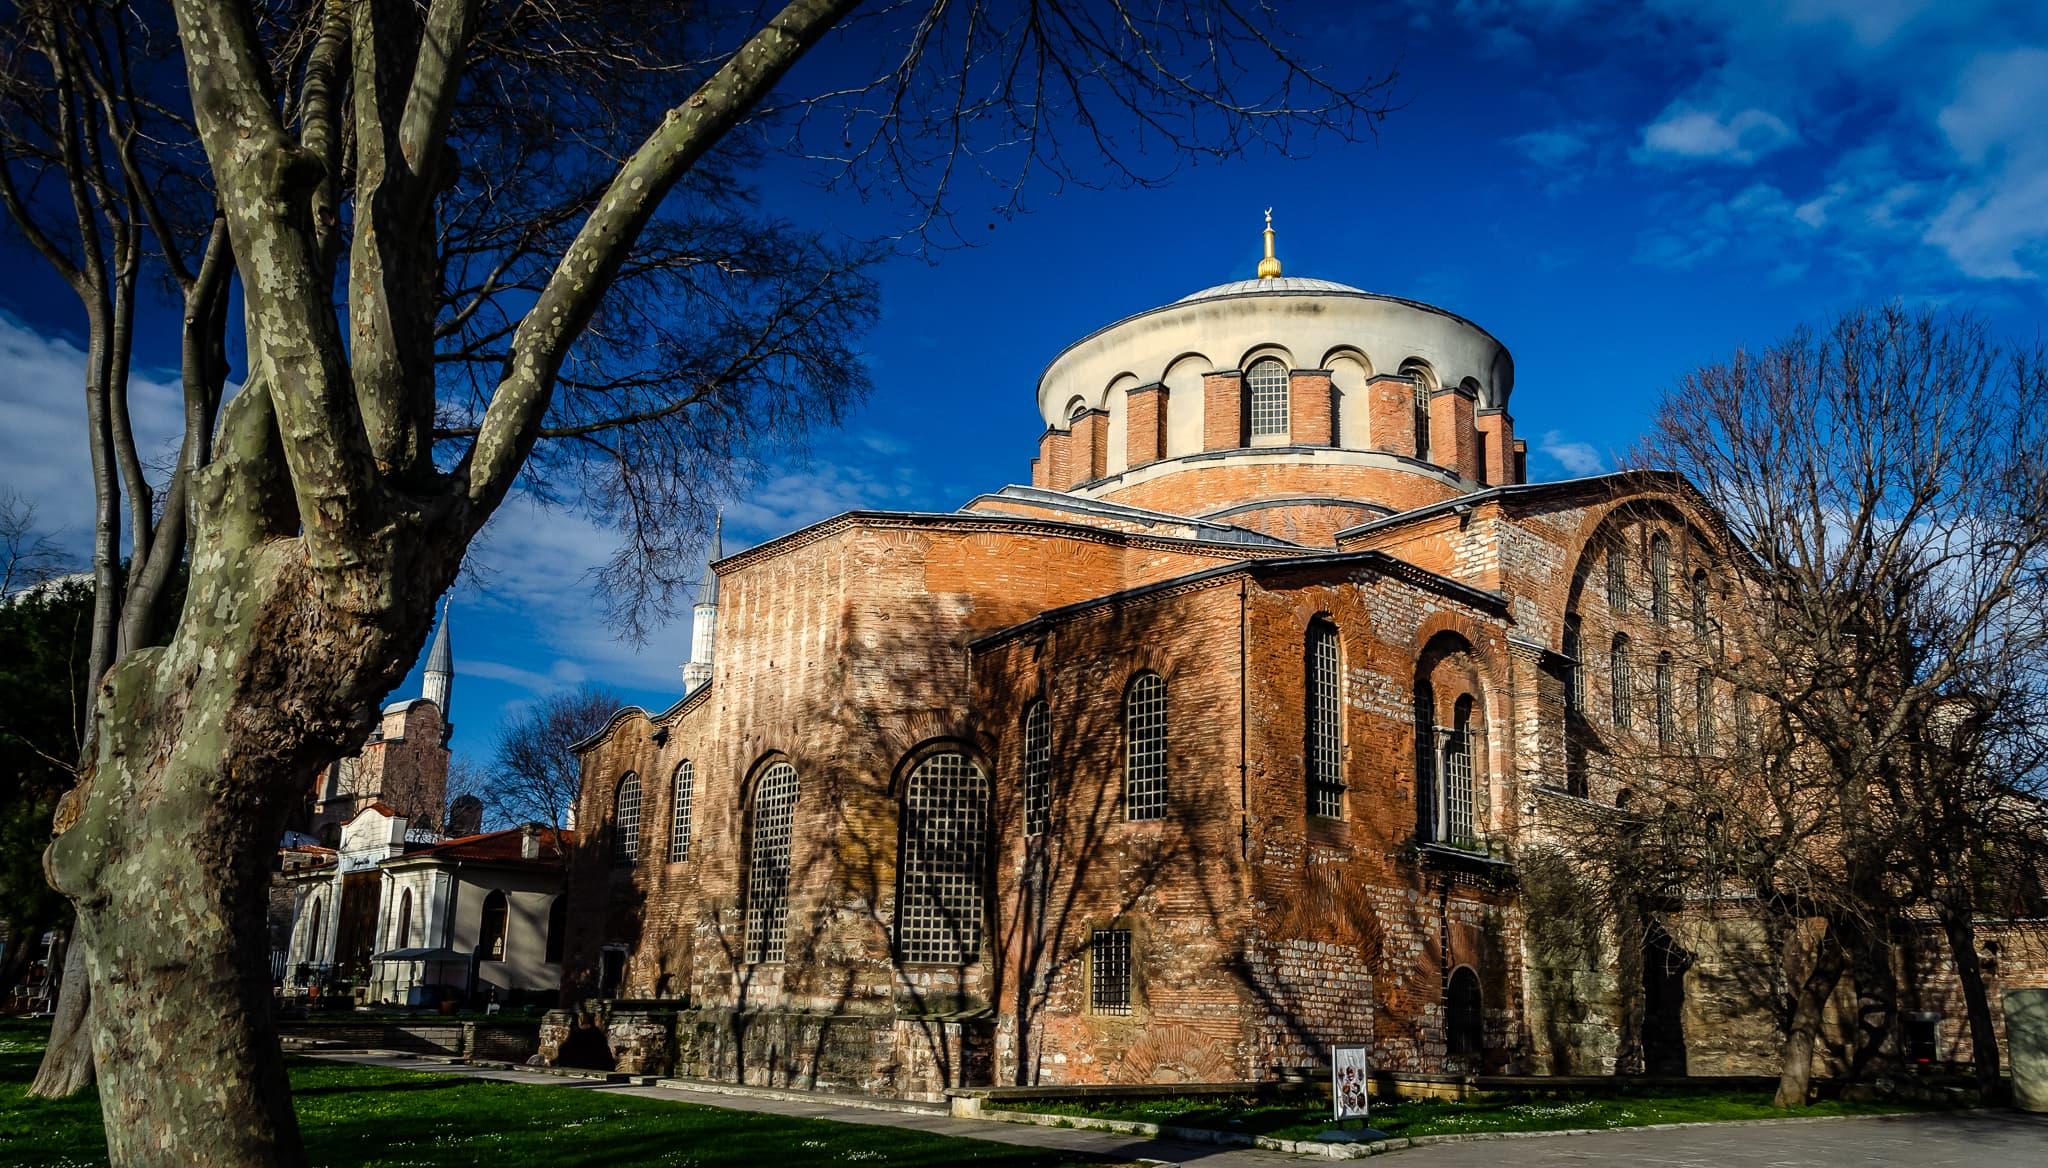 Istanbul's Hagia Irene